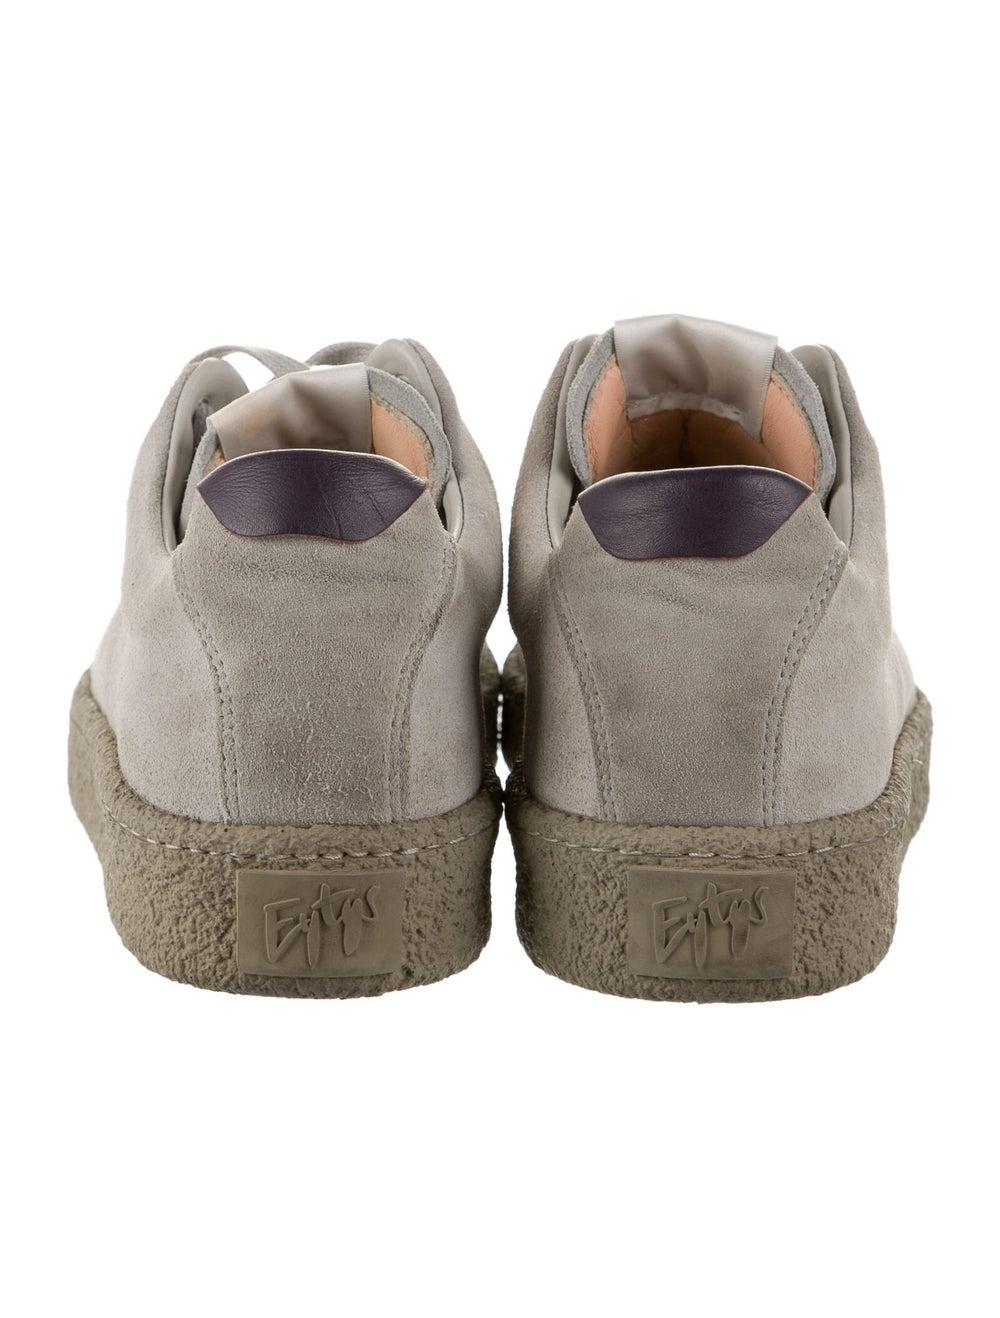 Eytys Suede Sneakers Grey - image 4